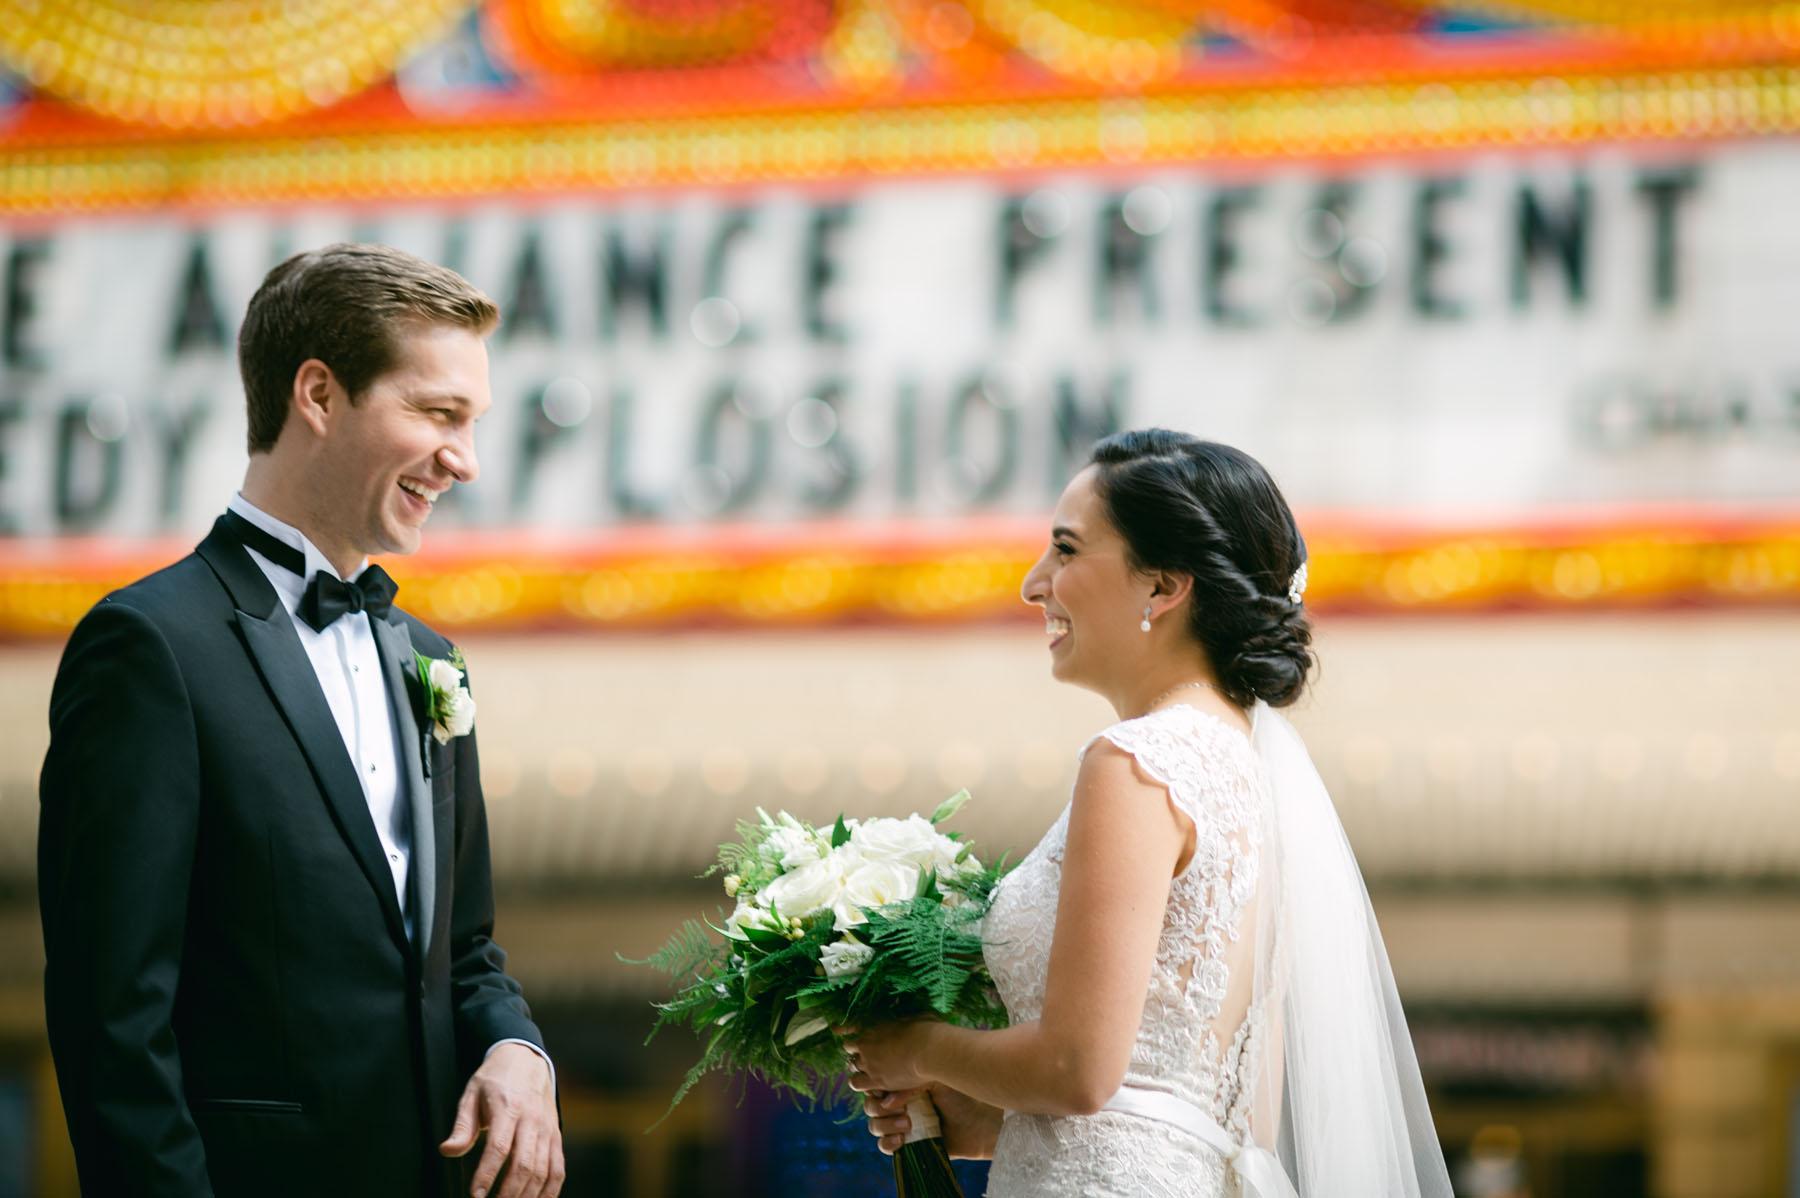 Chicago Theater Wedding